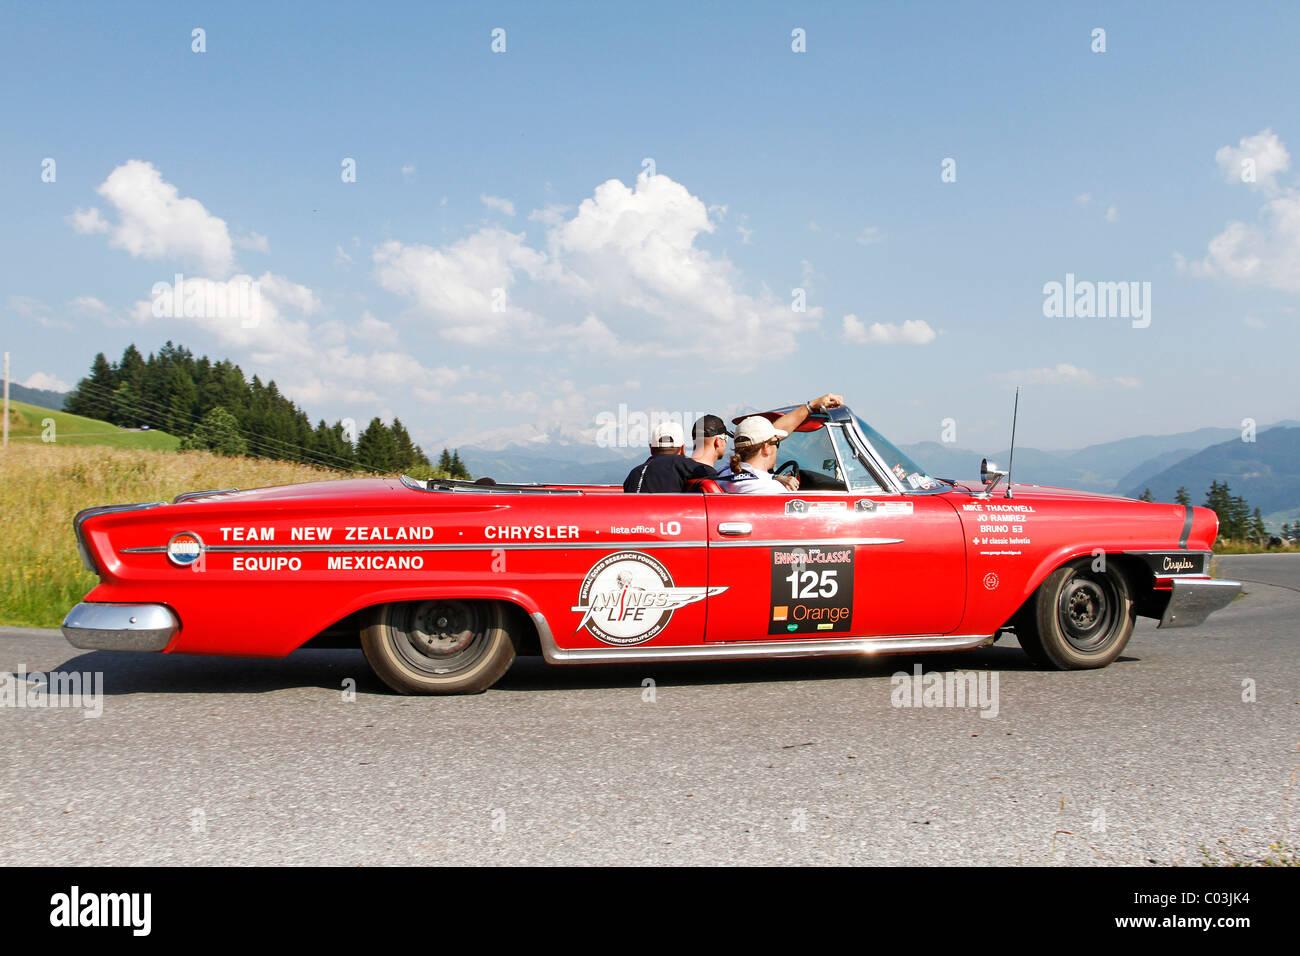 Chrysler 300 Built In 1962 Ennstal Classic 2010 Vintage Car Rally